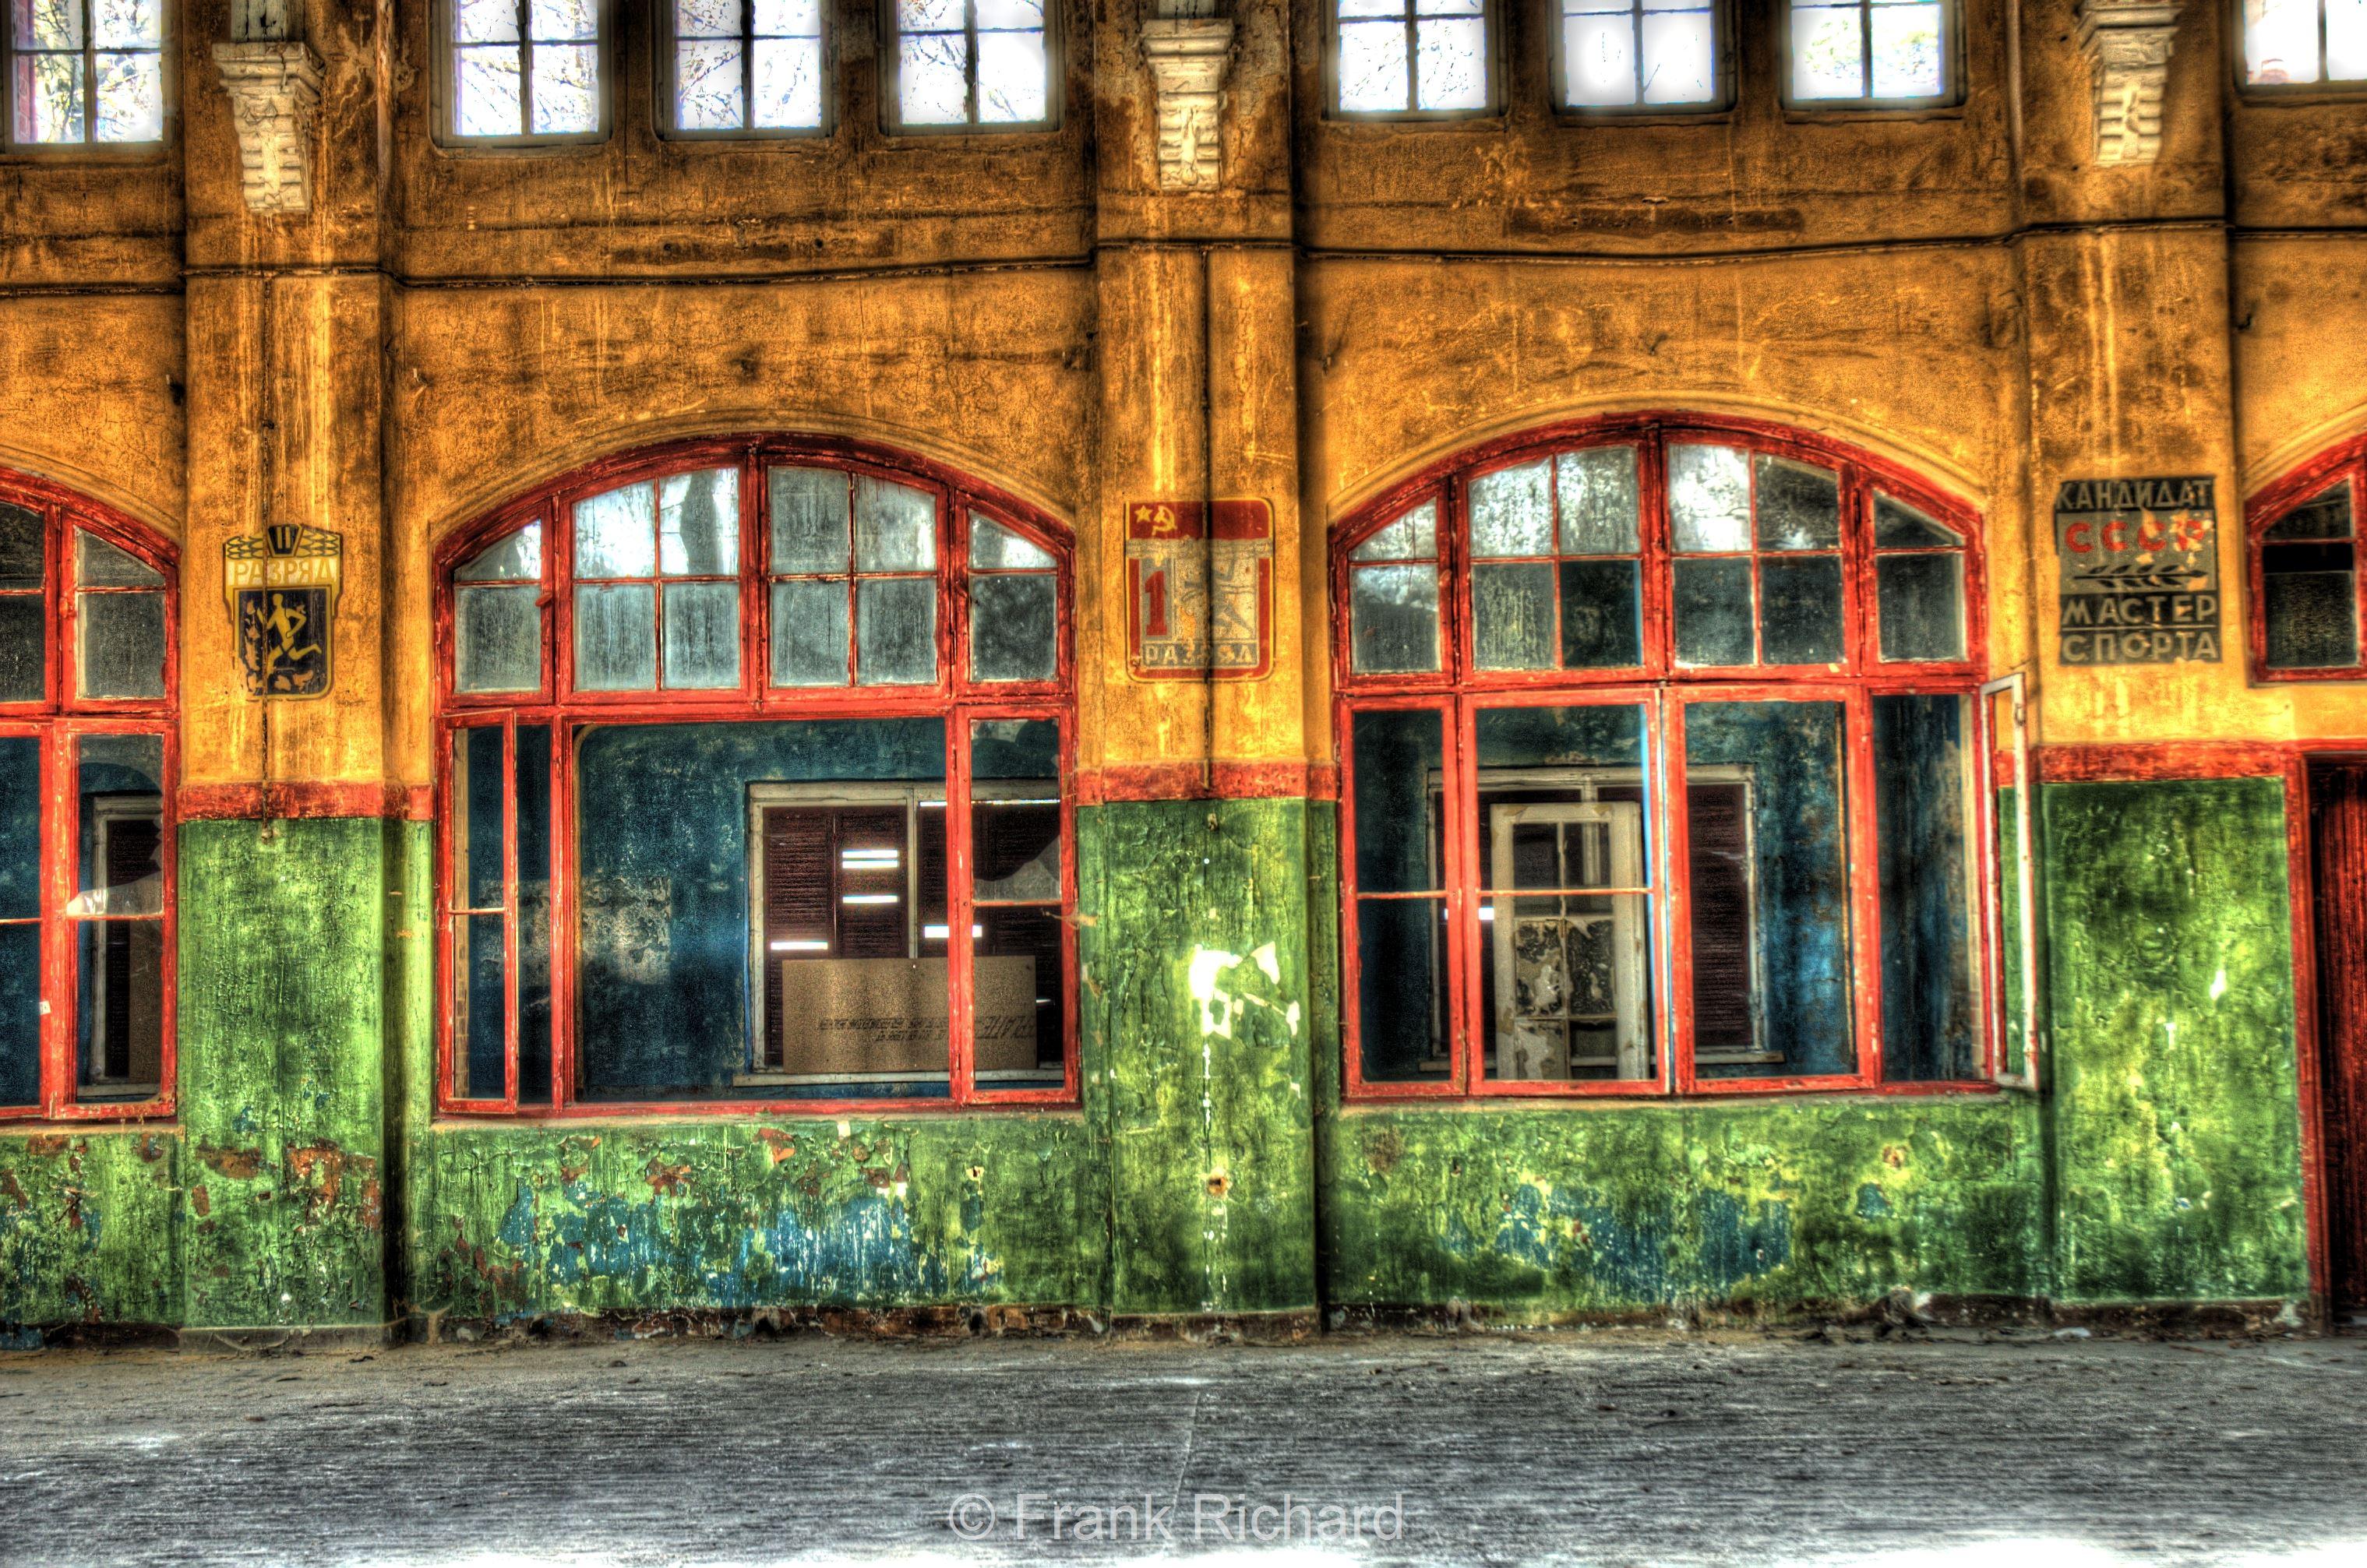 Beelitz 2014 Frank Richard (15)